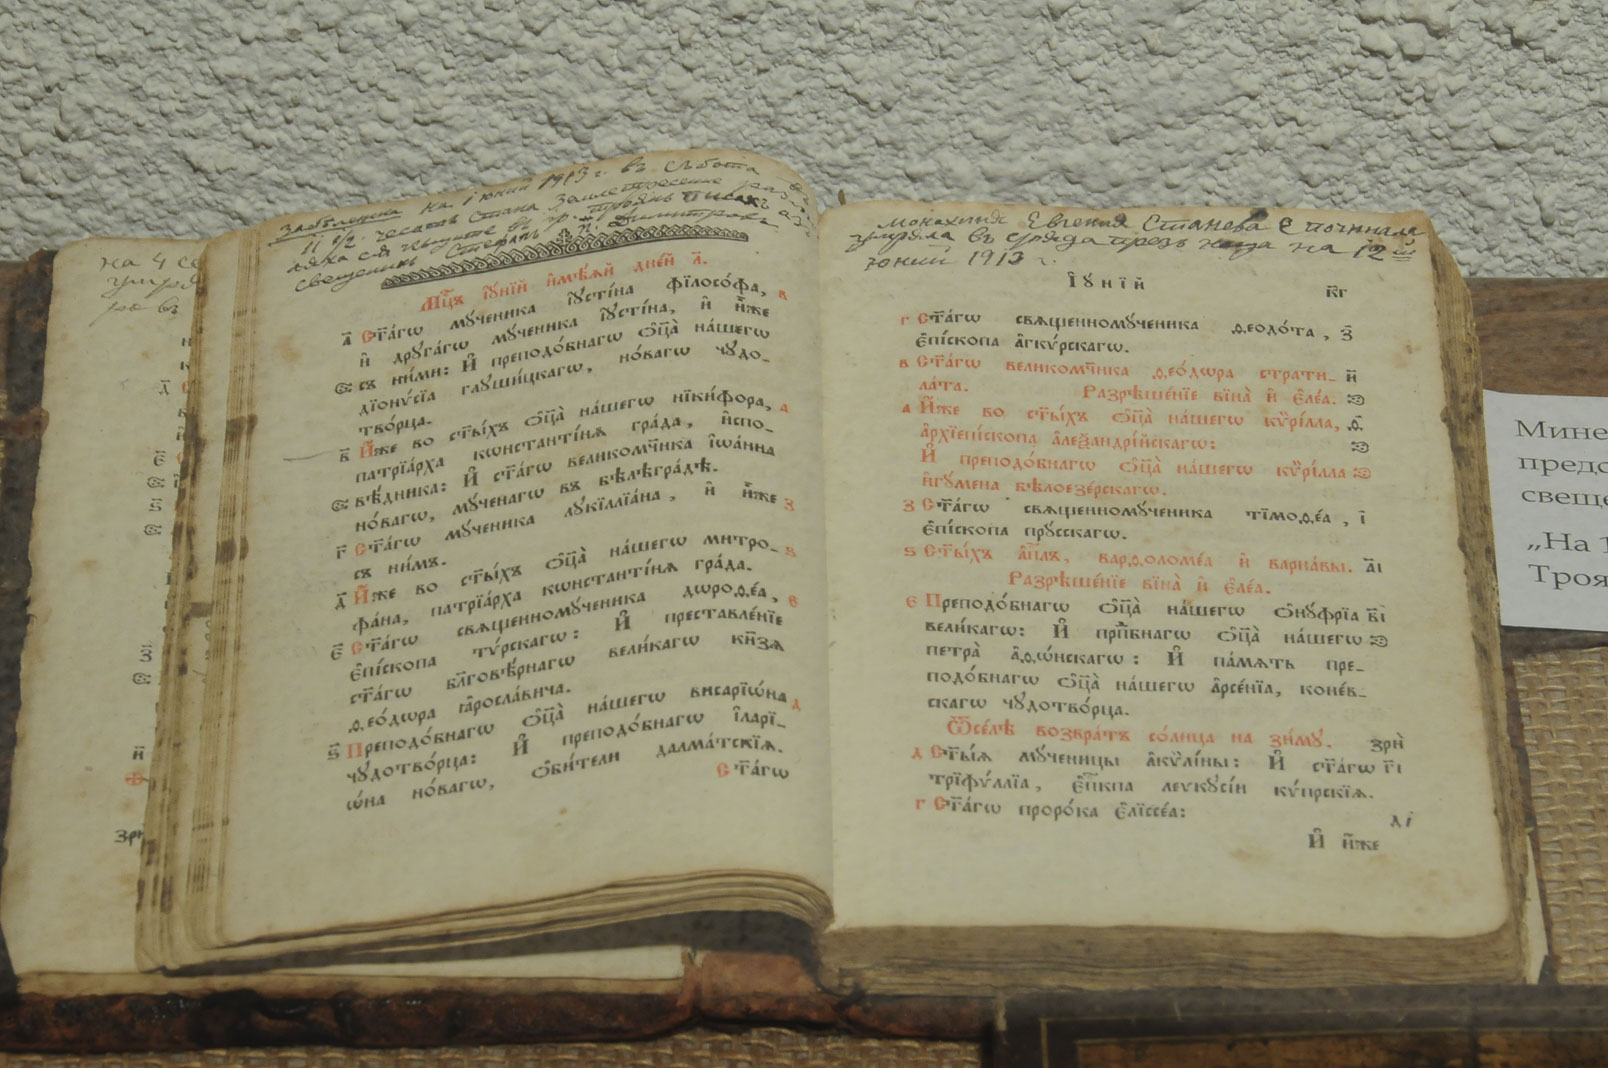 troyan-museum-180-godini-hram-cveta-paraskeva-4